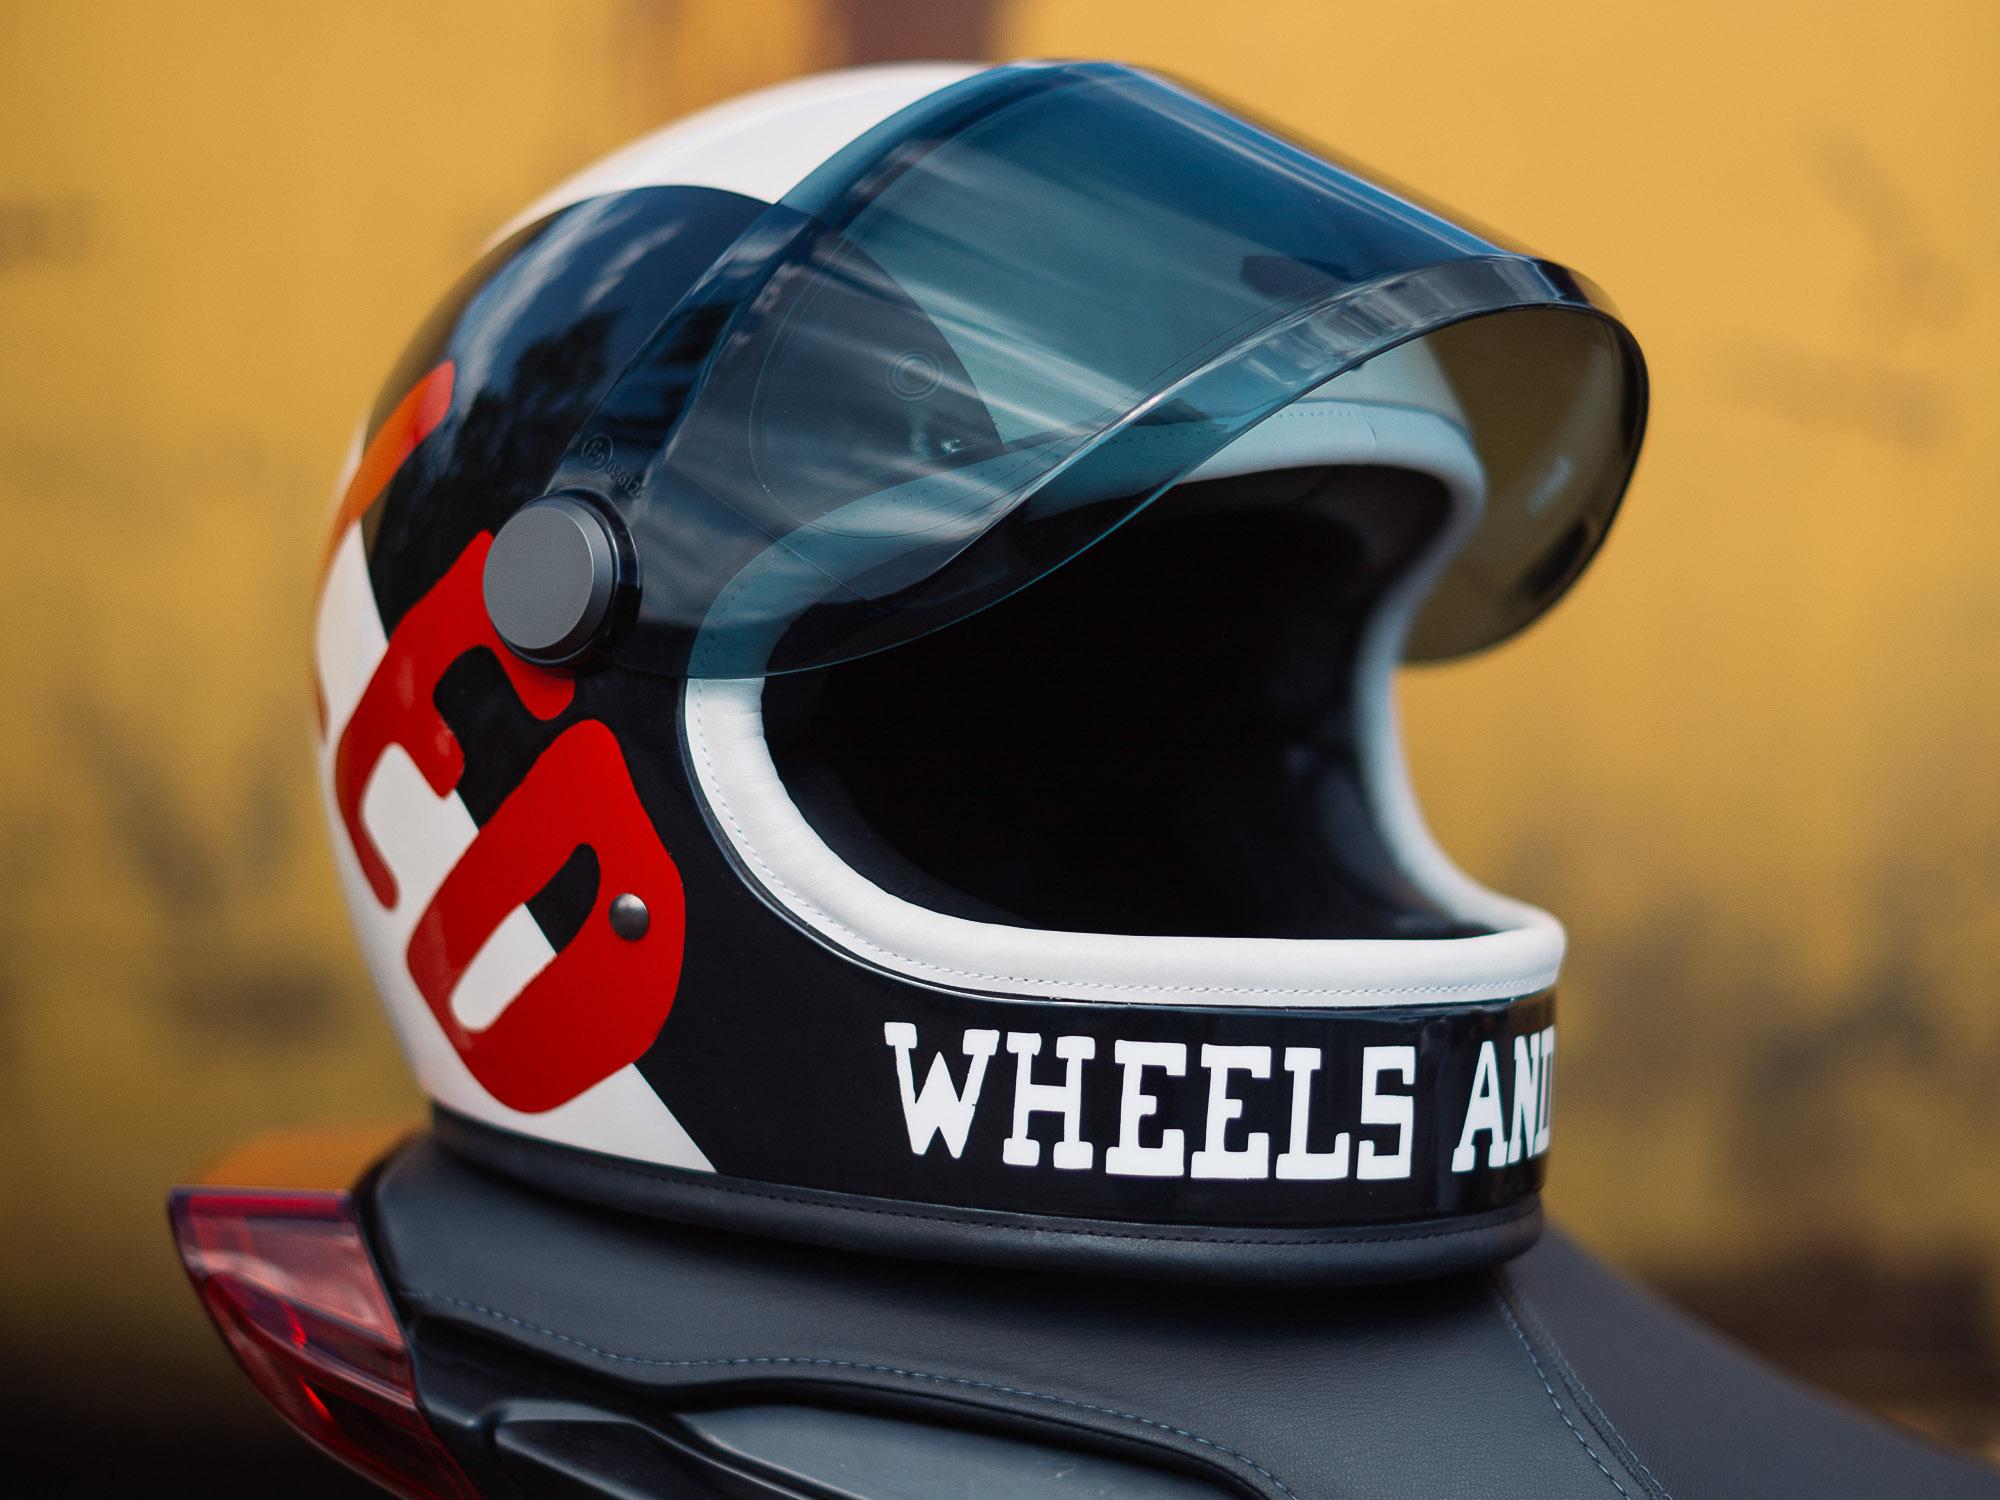 Hedon Helm im exklusiven Indian Motorcycle X Wheels & Waves Design